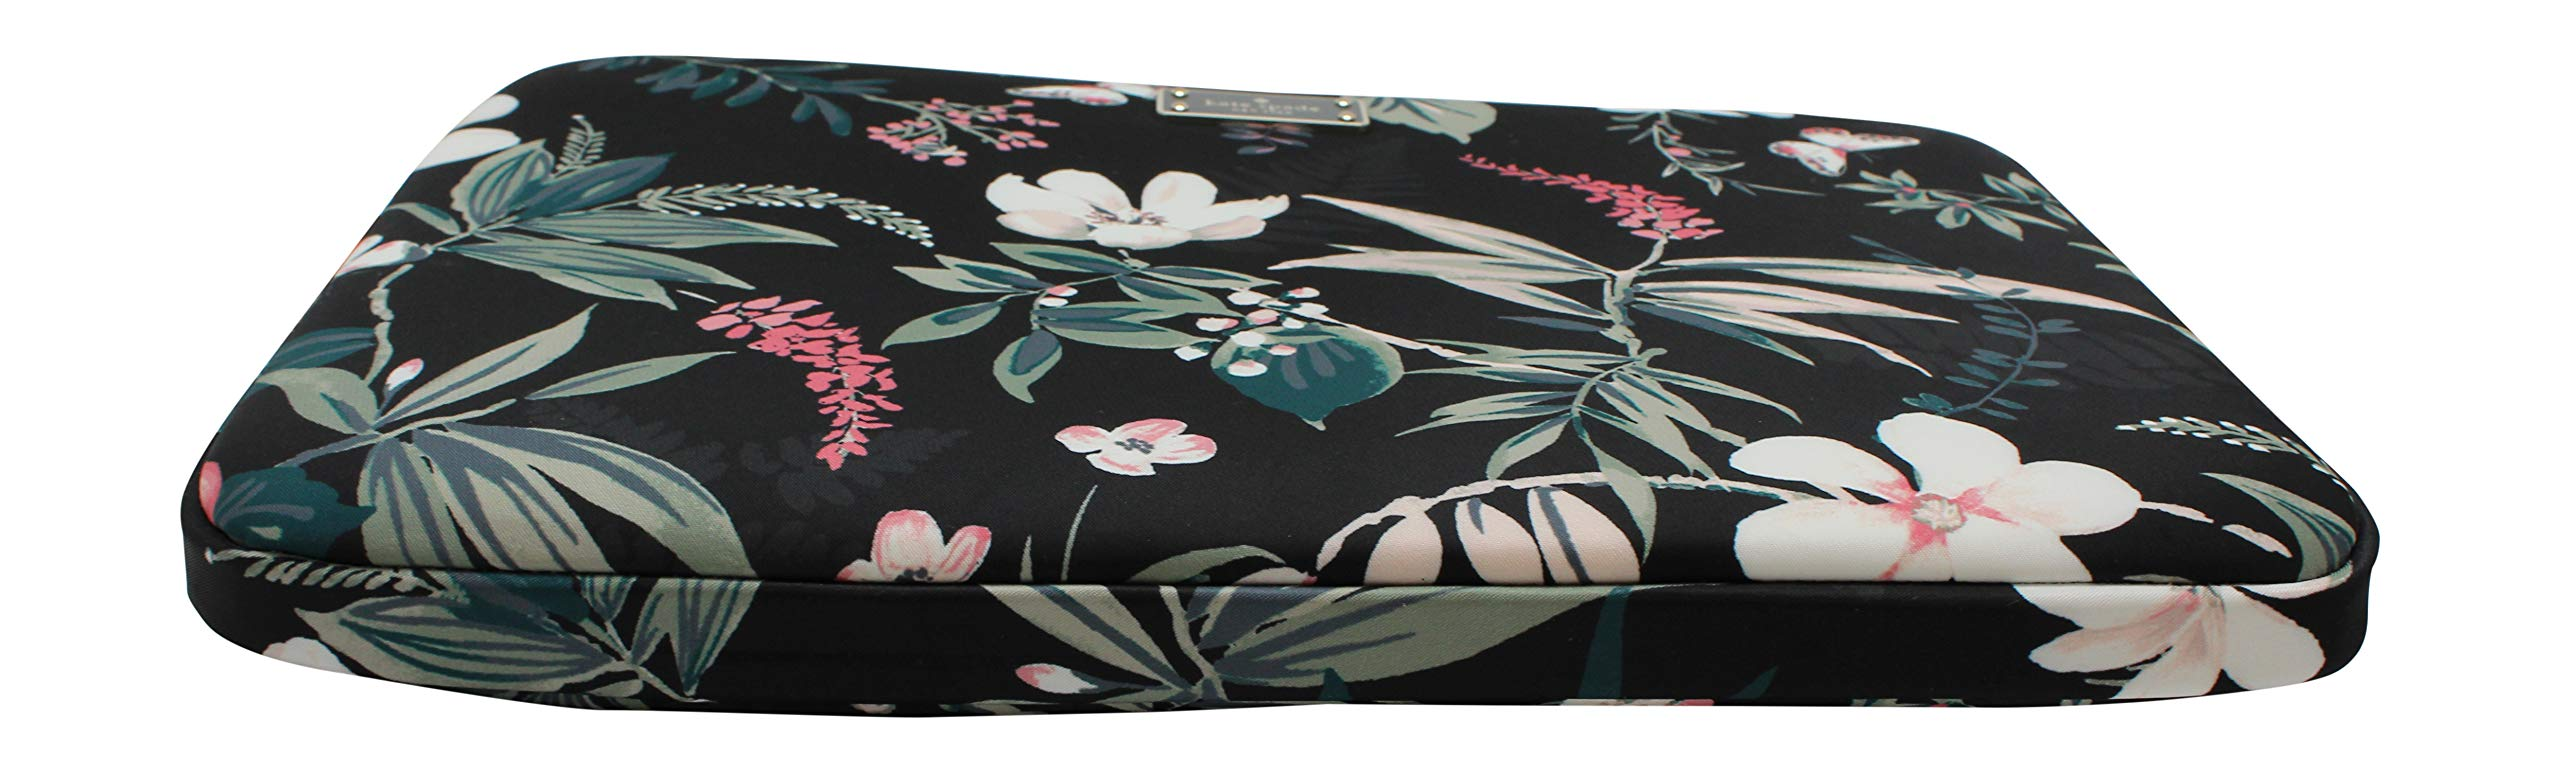 Kate Spade Wilson Rd Botanical Laptop Case Sleeve Black Multi 13'' by Kate Spade New York (Image #4)